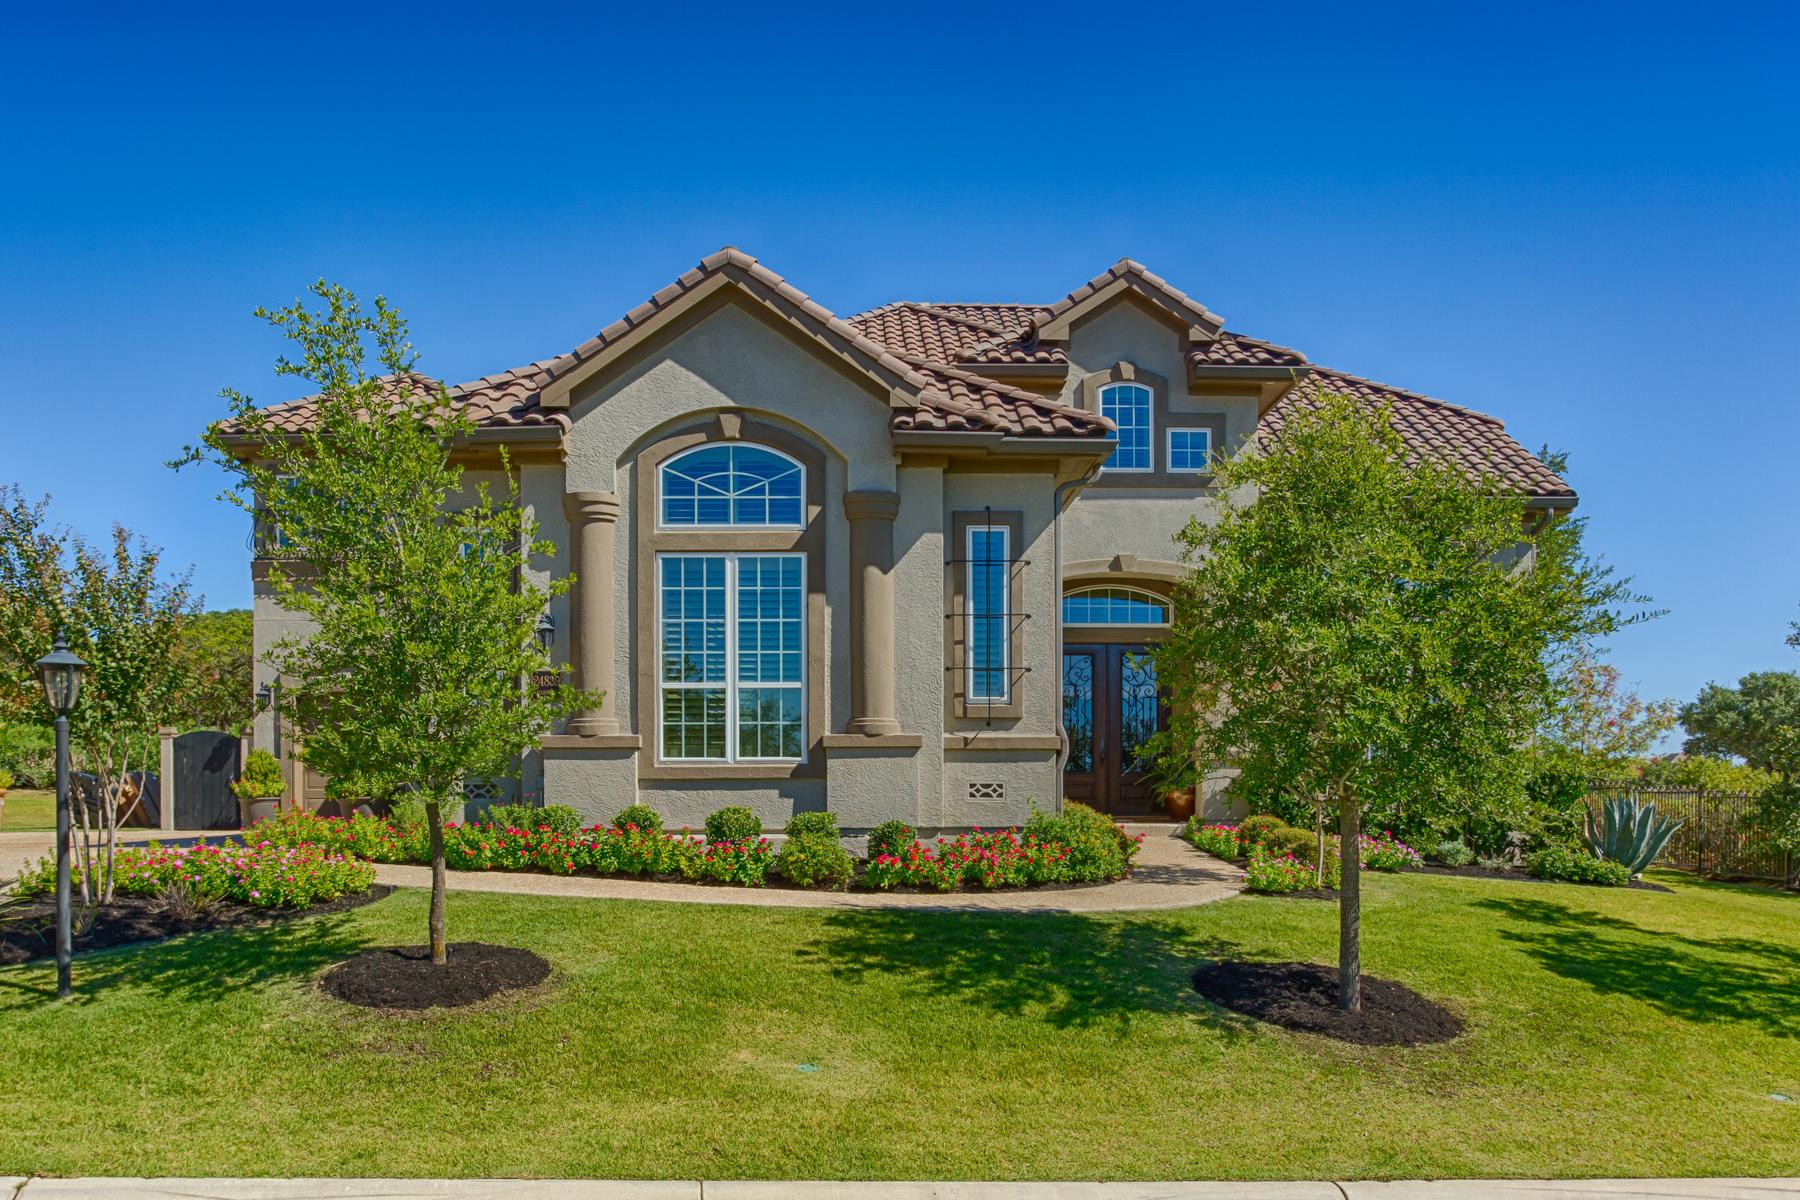 獨棟家庭住宅 為 出售 在 Award Winning Custom Home in The Dominion 24839 Ellesmere The Dominion, San Antonio, 德克薩斯州, 78257 美國